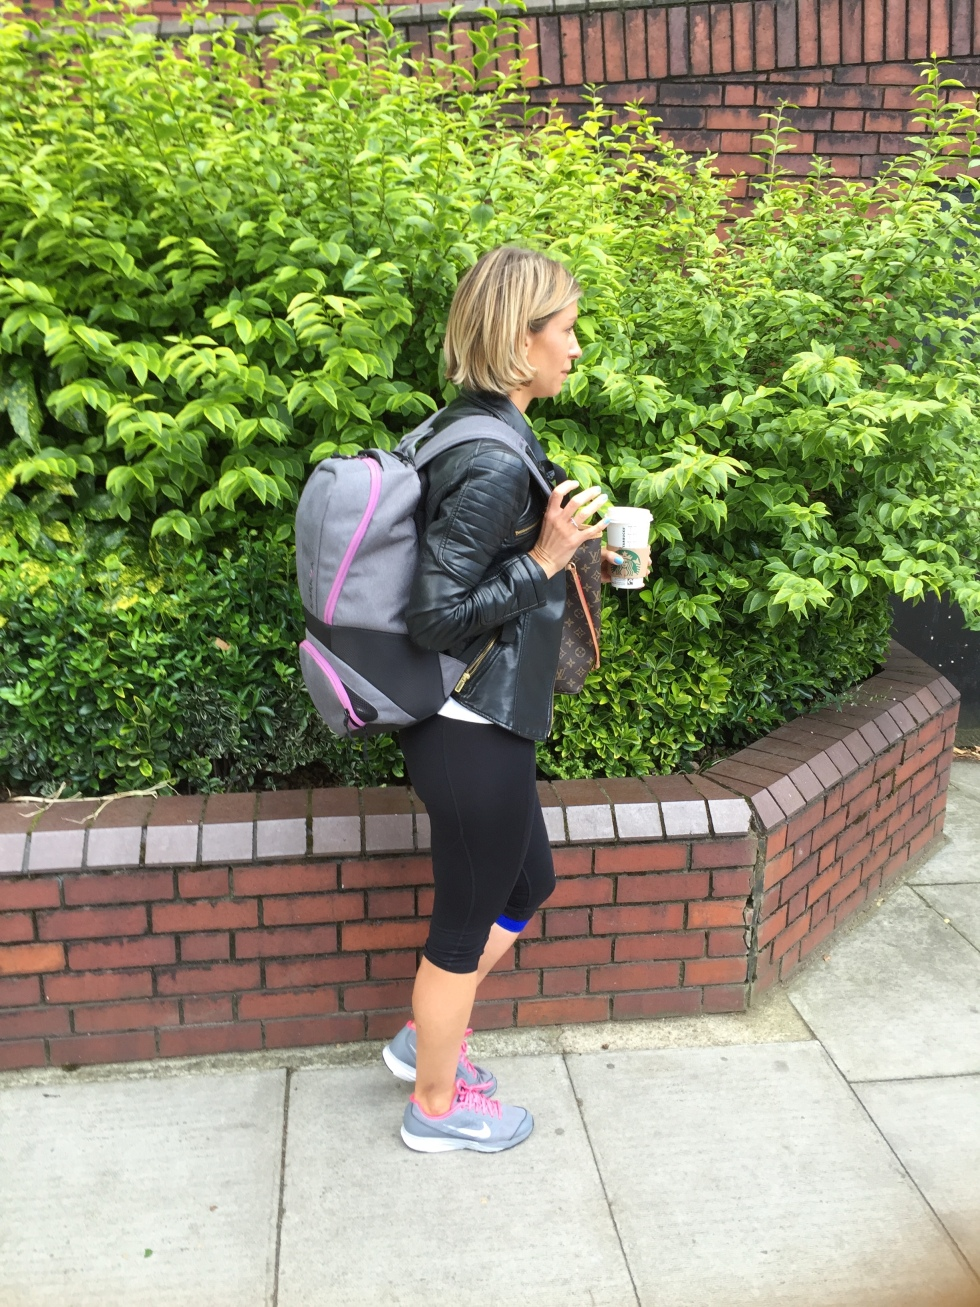 sports bag KARKOA Wildcat Fitness UK.jpg